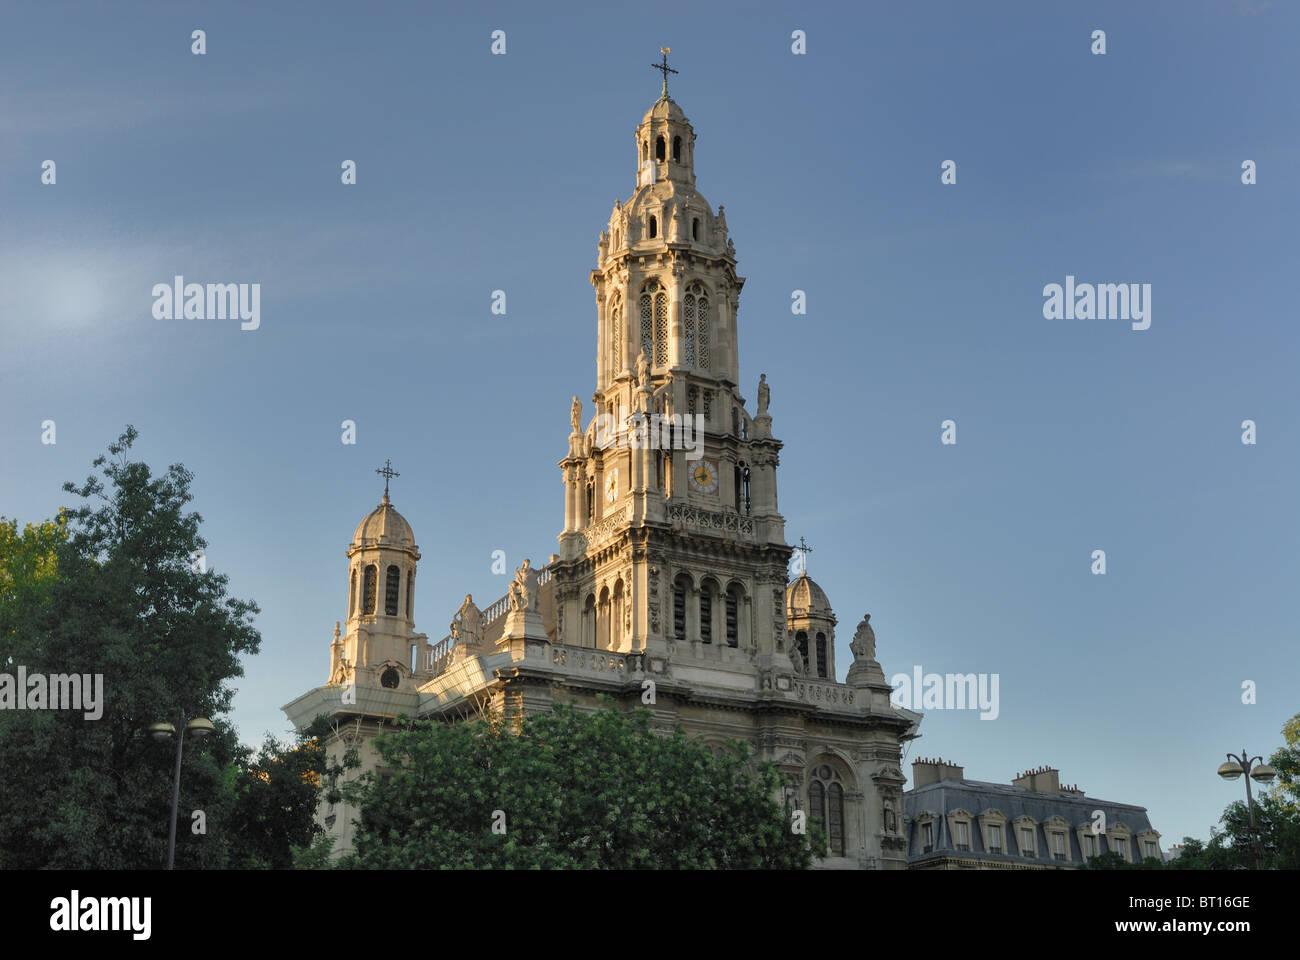 The Église de la Sainte-Trinité, a Roman Catholic church built between 1861 and 1867, located in the 9th - Stock Image